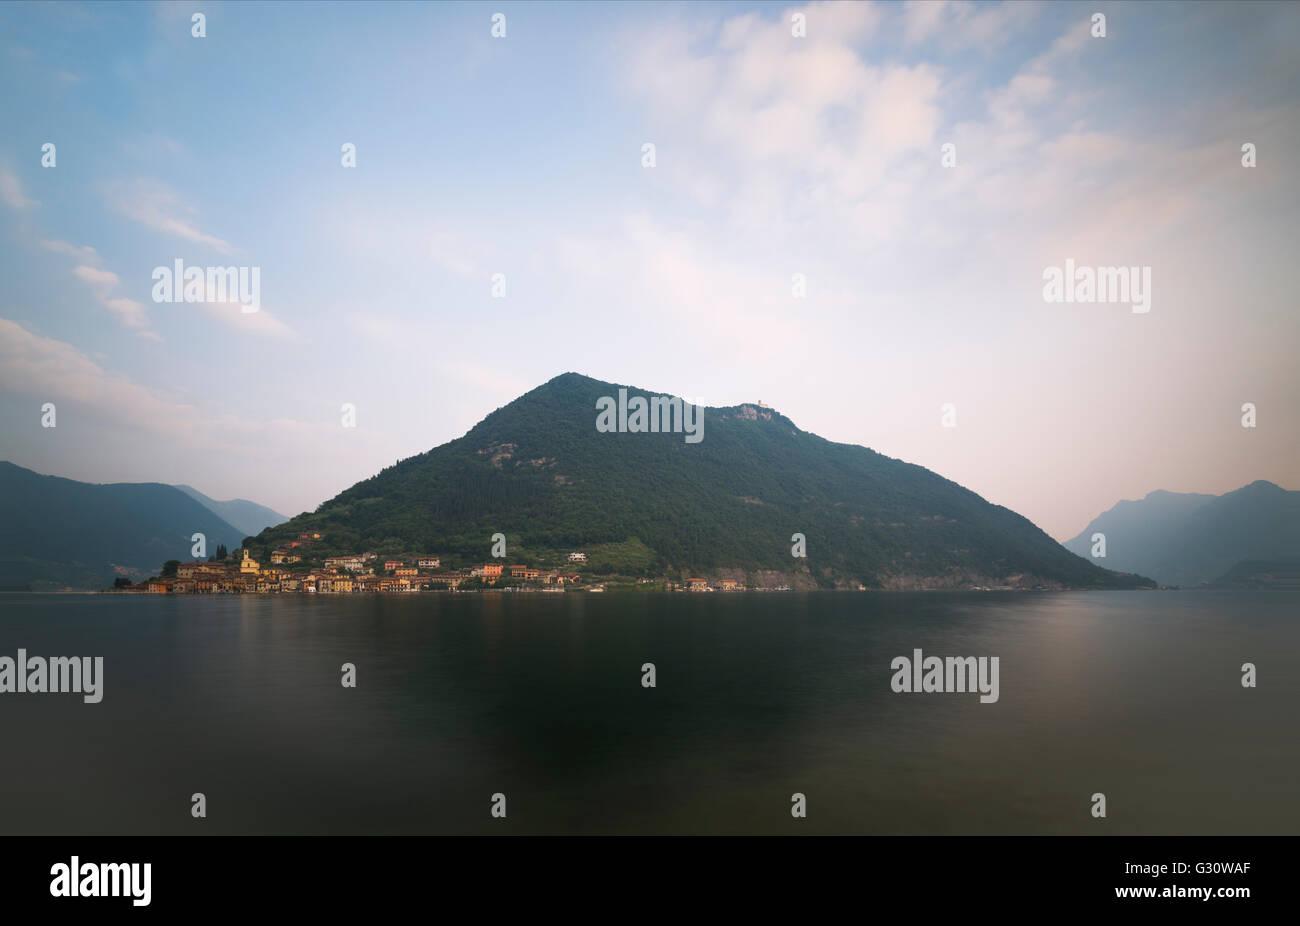 Panorama of scenery with Monte Isola island at Lake Iseo at sunrise,Sulzano,Lombardy,Italy - Stock Image